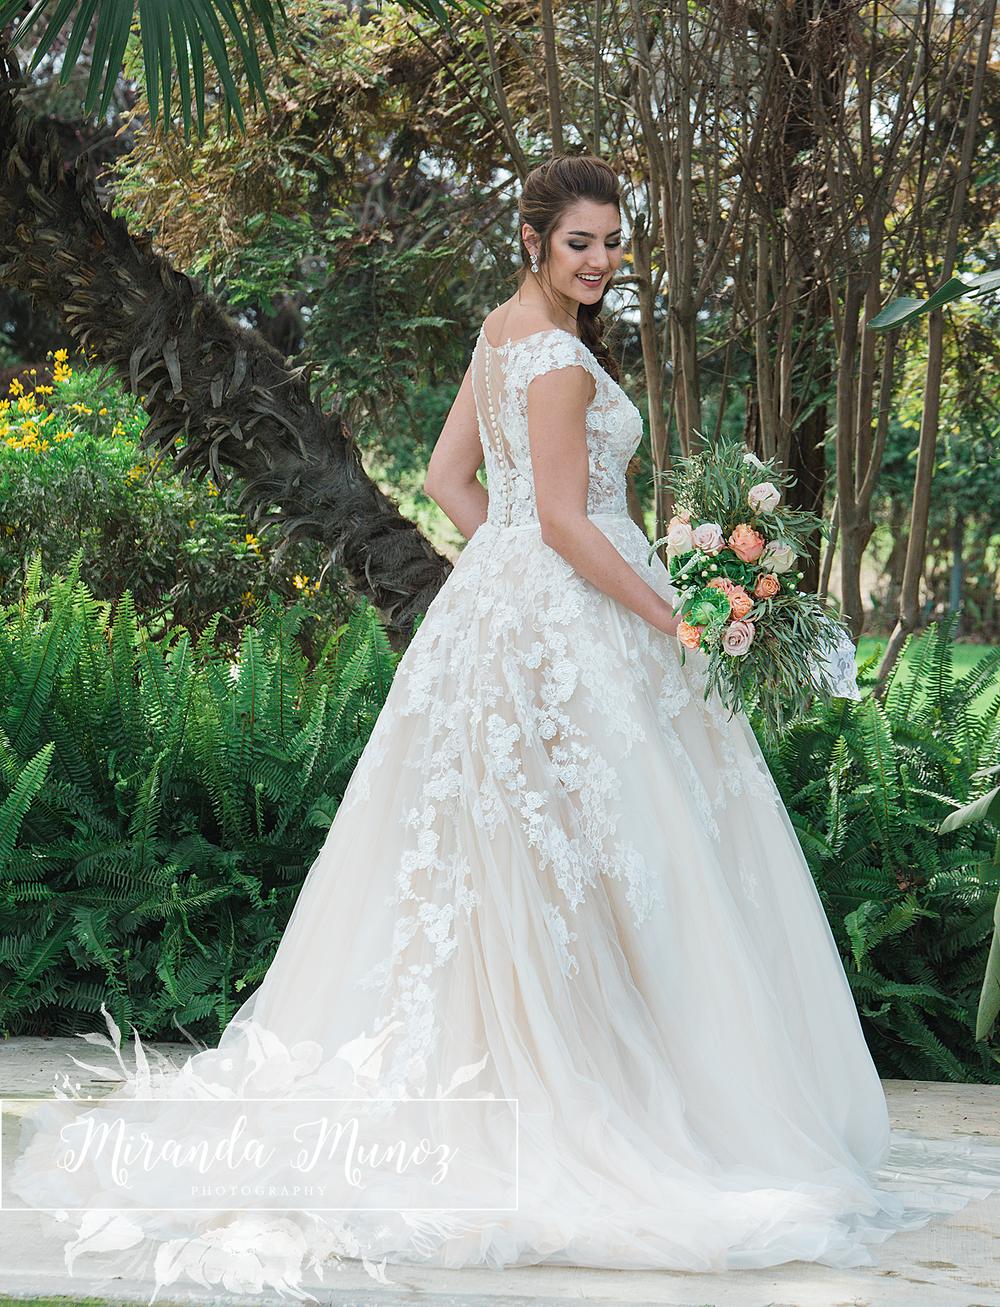 Wedding Jewelry - Boho Romantic Wedding